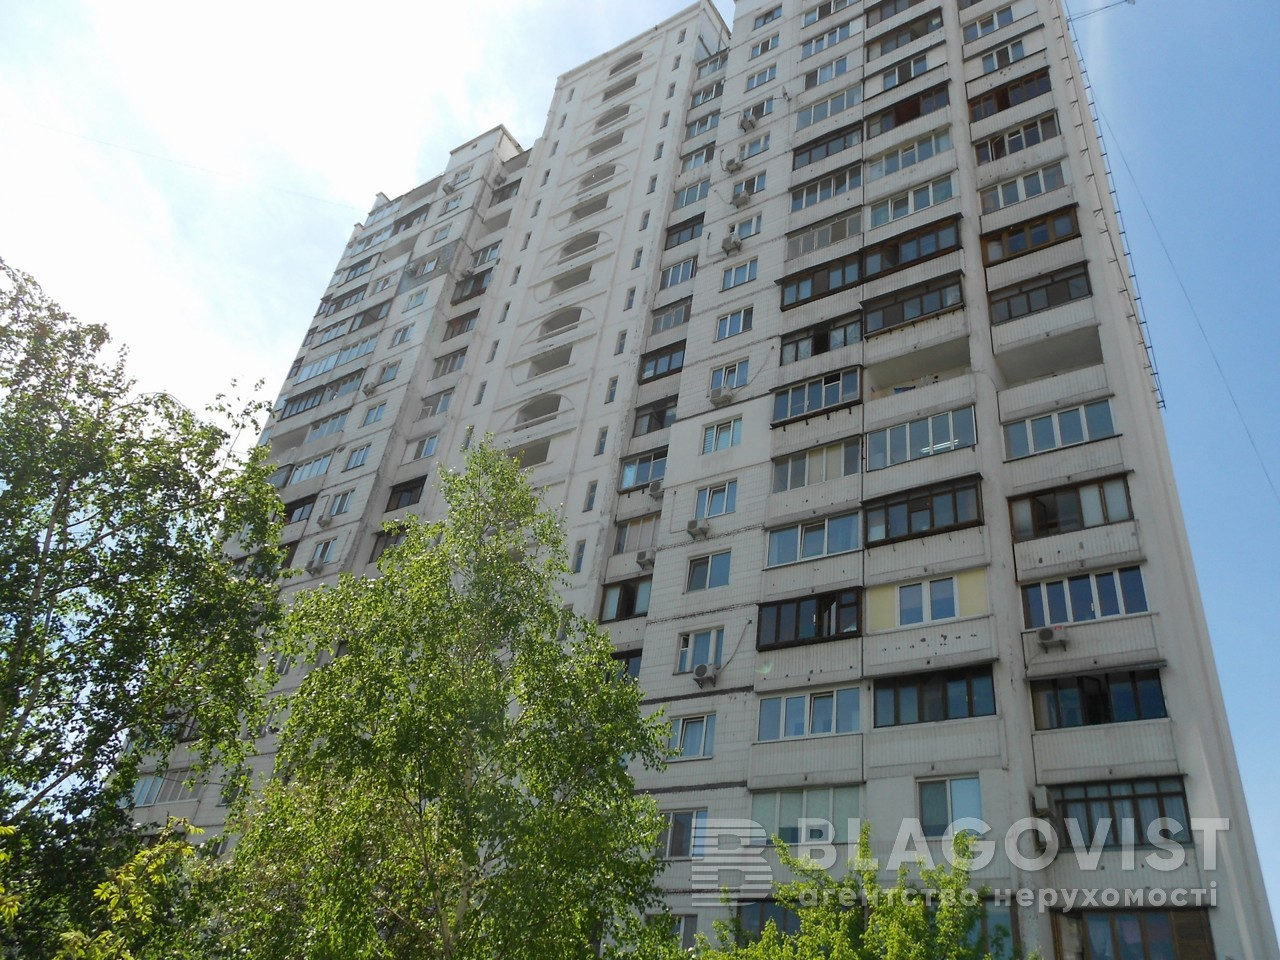 Квартира R-39492, Гришко Михаила, 10, Киев - Фото 4